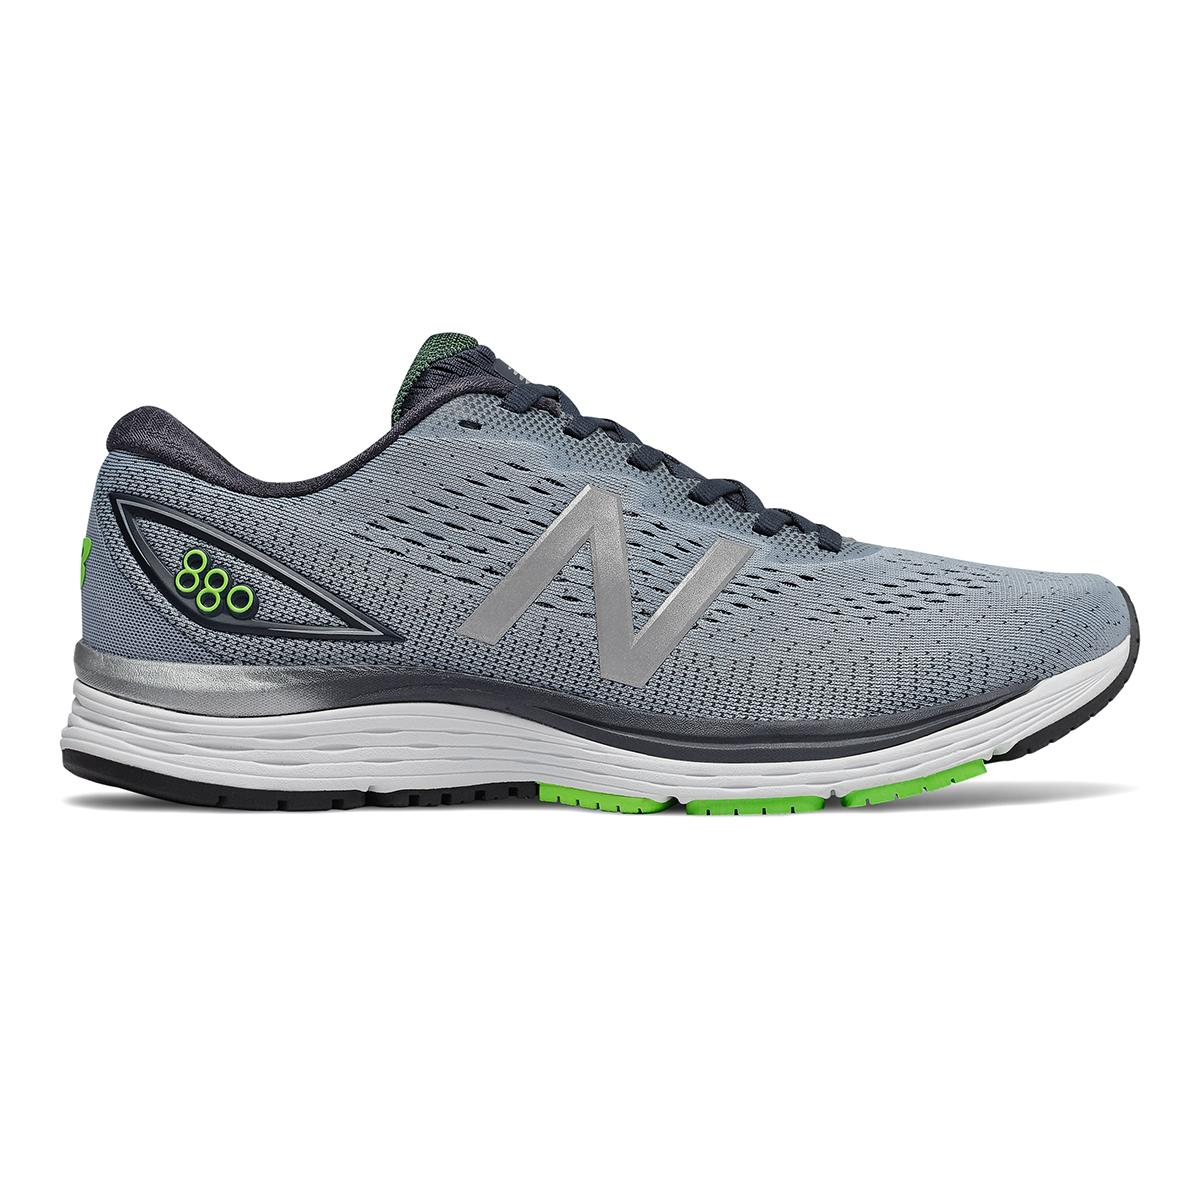 New Balance 880v9 Running Shoes $59.98 + Free Shipping